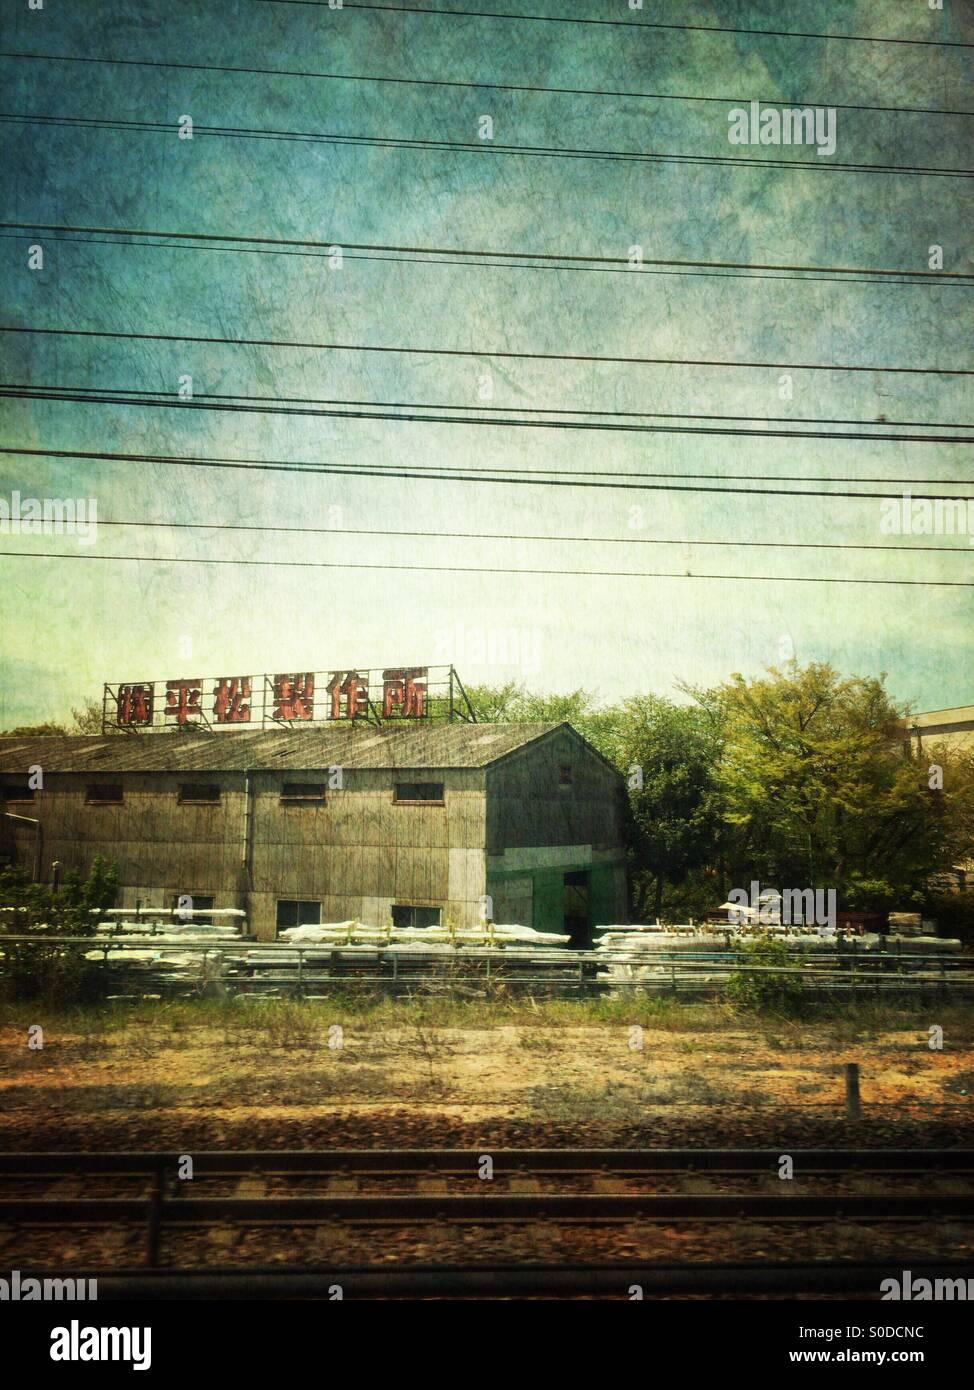 Hiramatsu Seisakujo, manufacturer of machinery parts in Nagoya, Japan. View from Shinkansen or bullet train window. - Stock Image